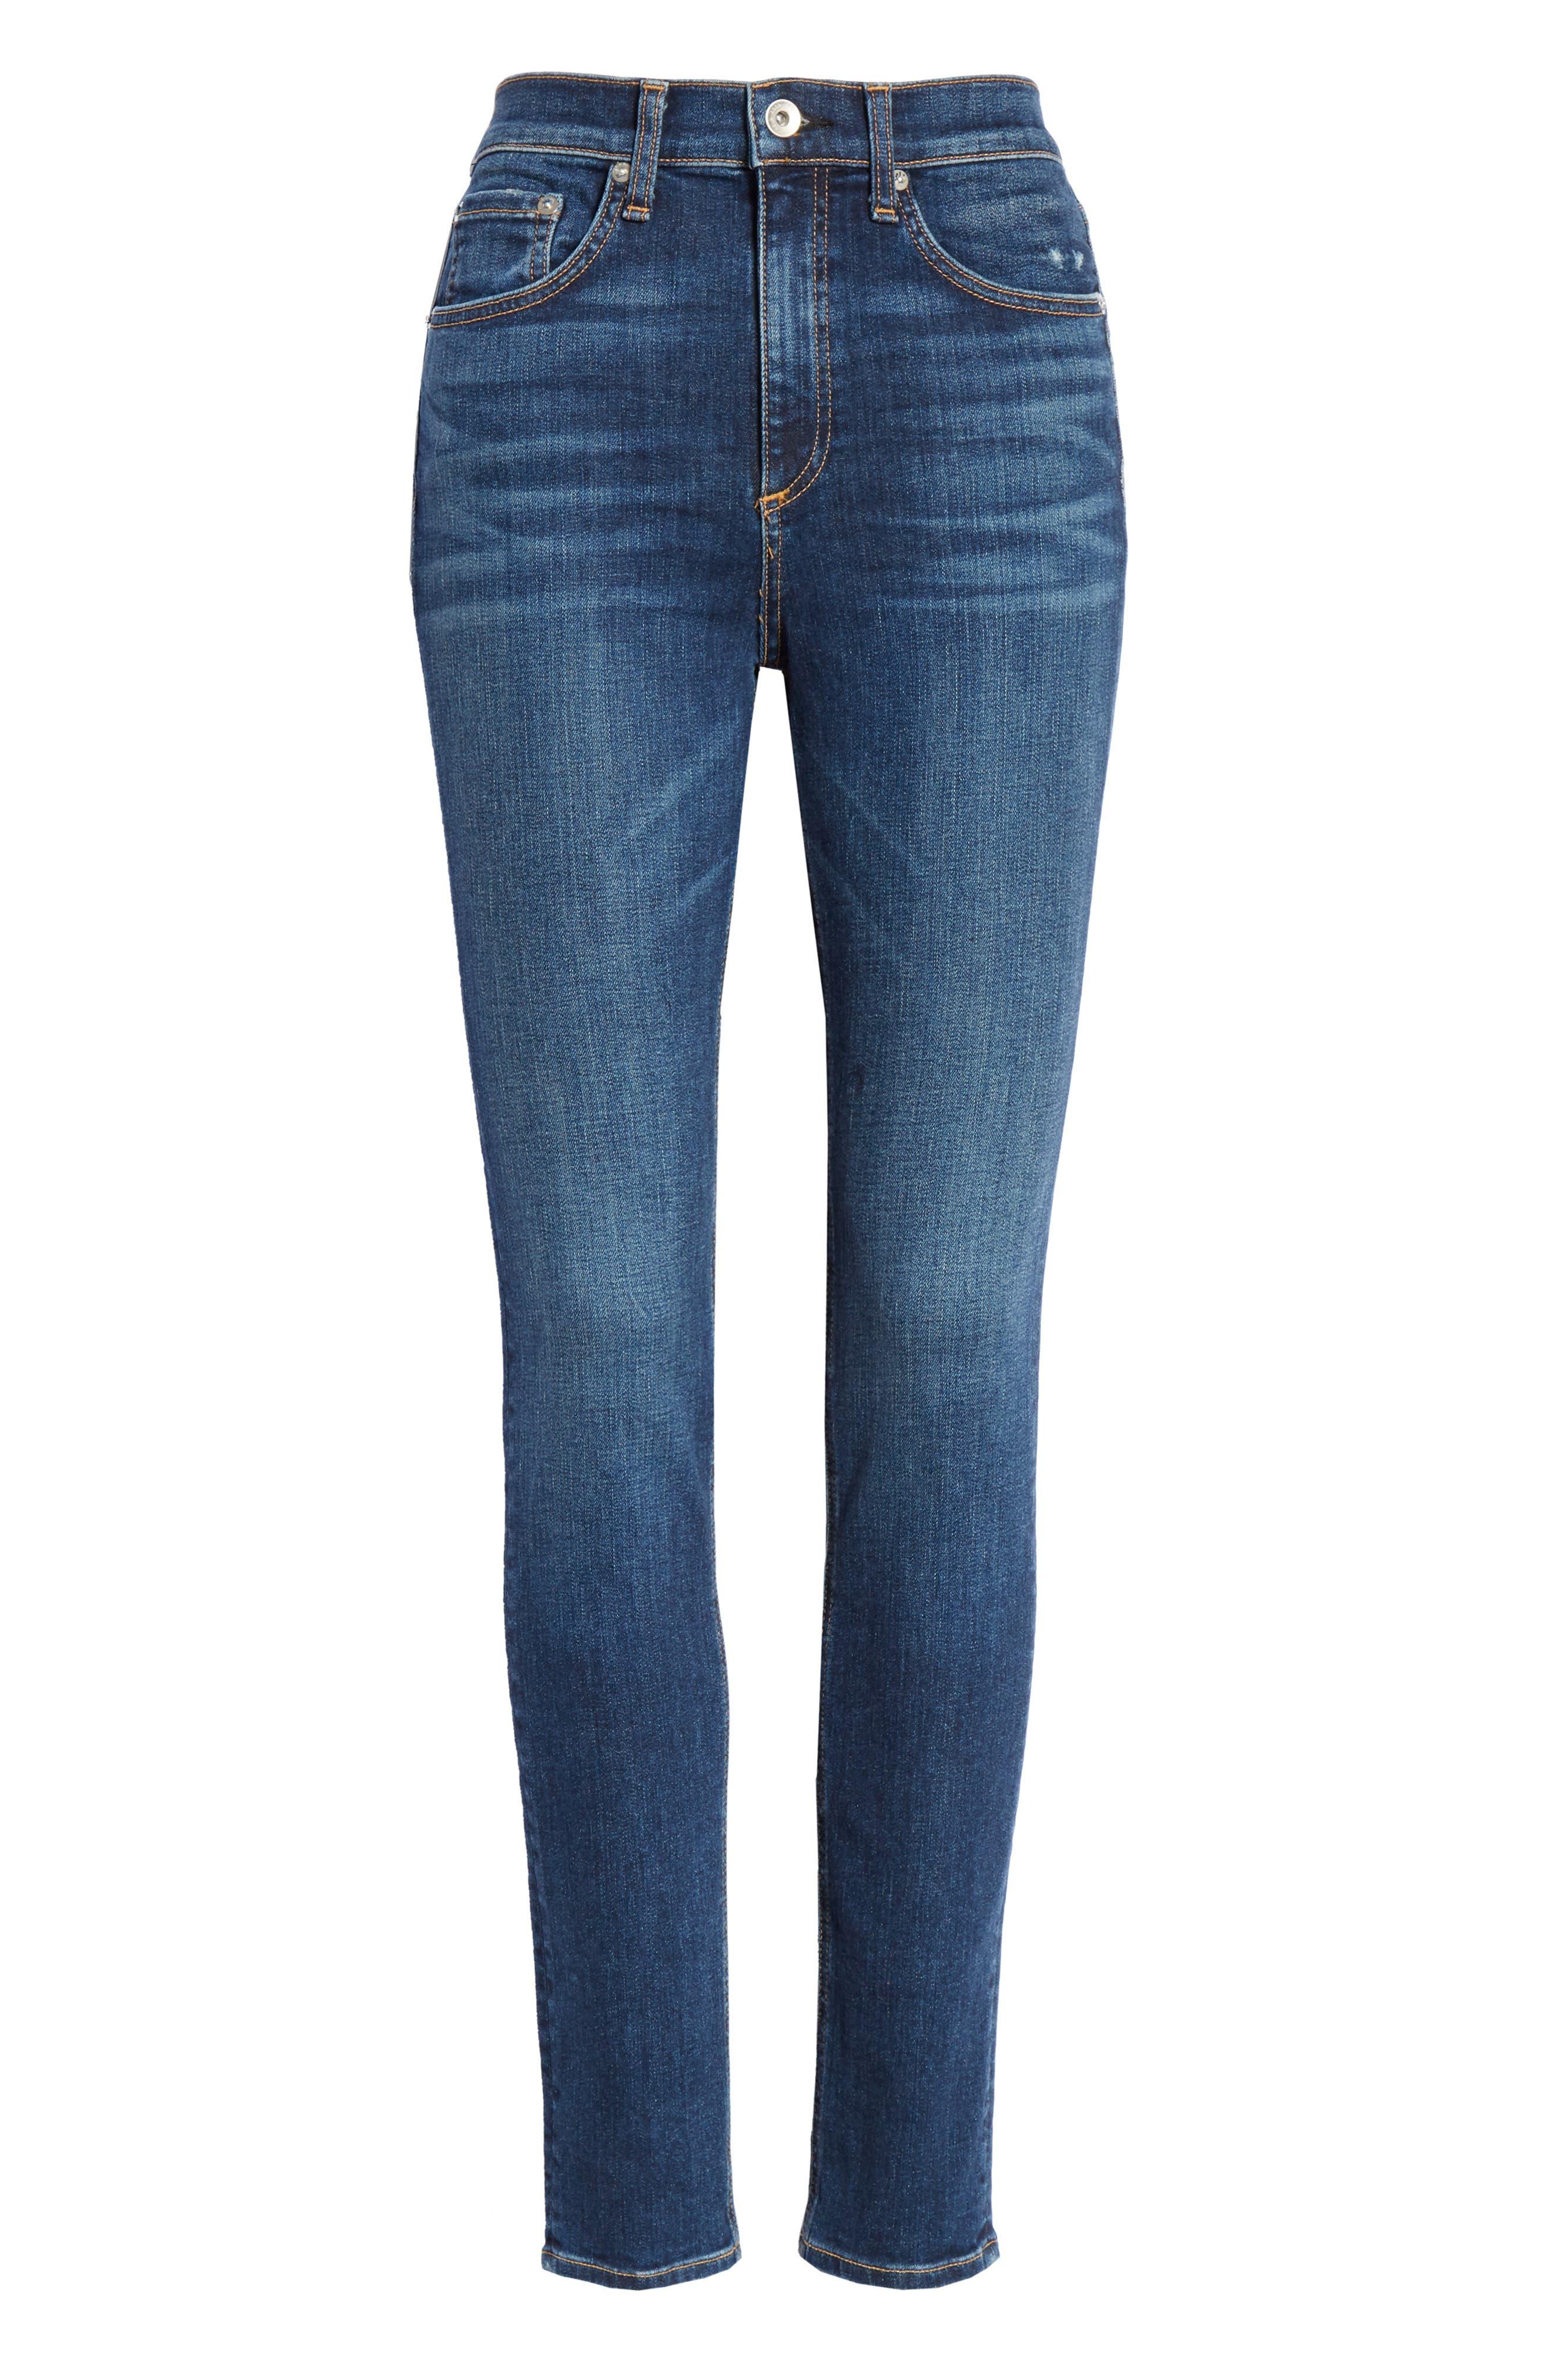 Ripped High Waist Skinny Jeans,                             Alternate thumbnail 7, color,                             ELTON